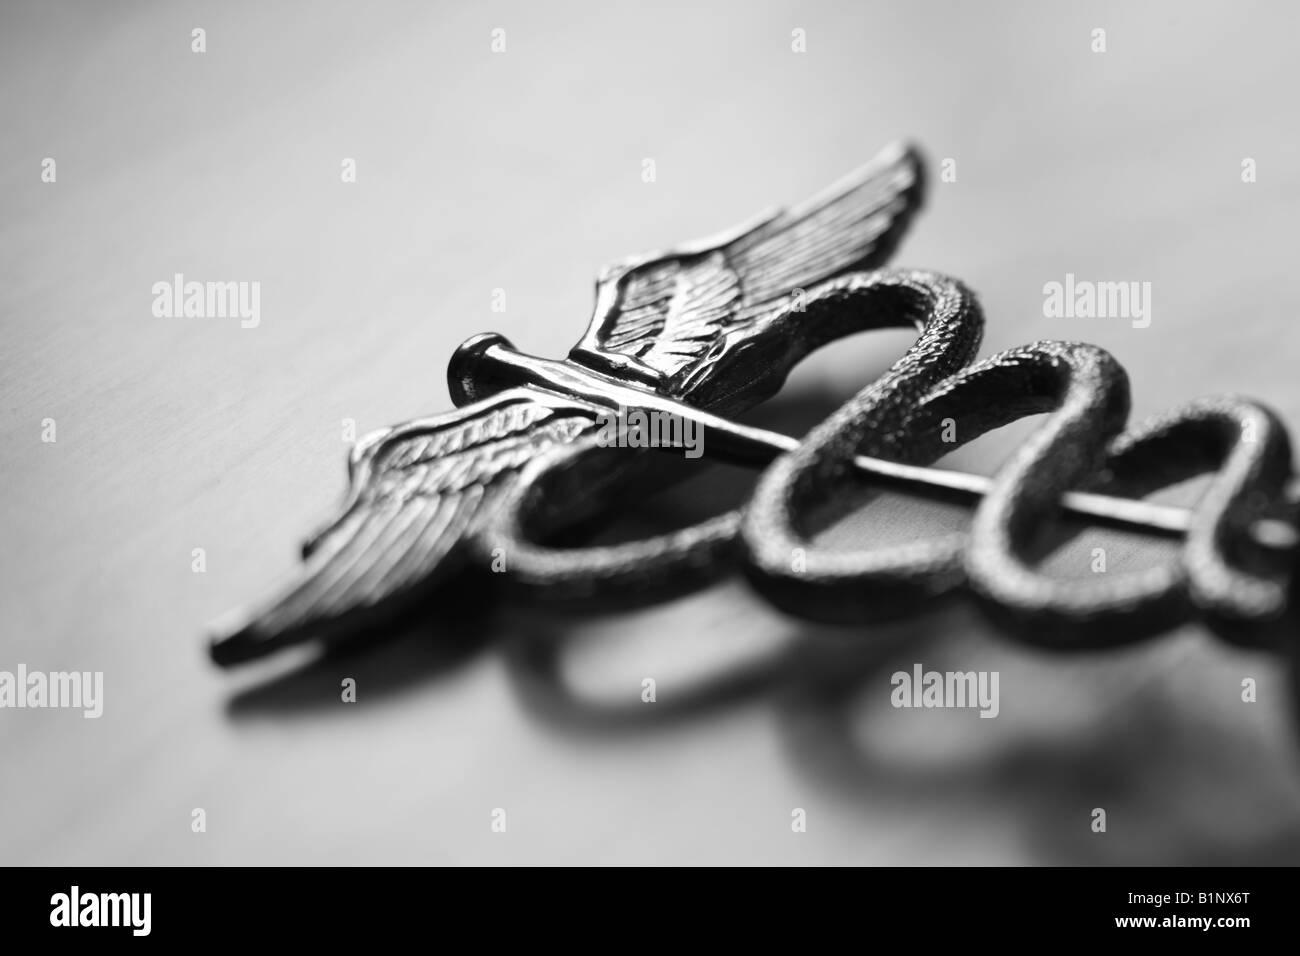 Caduceus medical symbol black and white selective focus - Stock Image